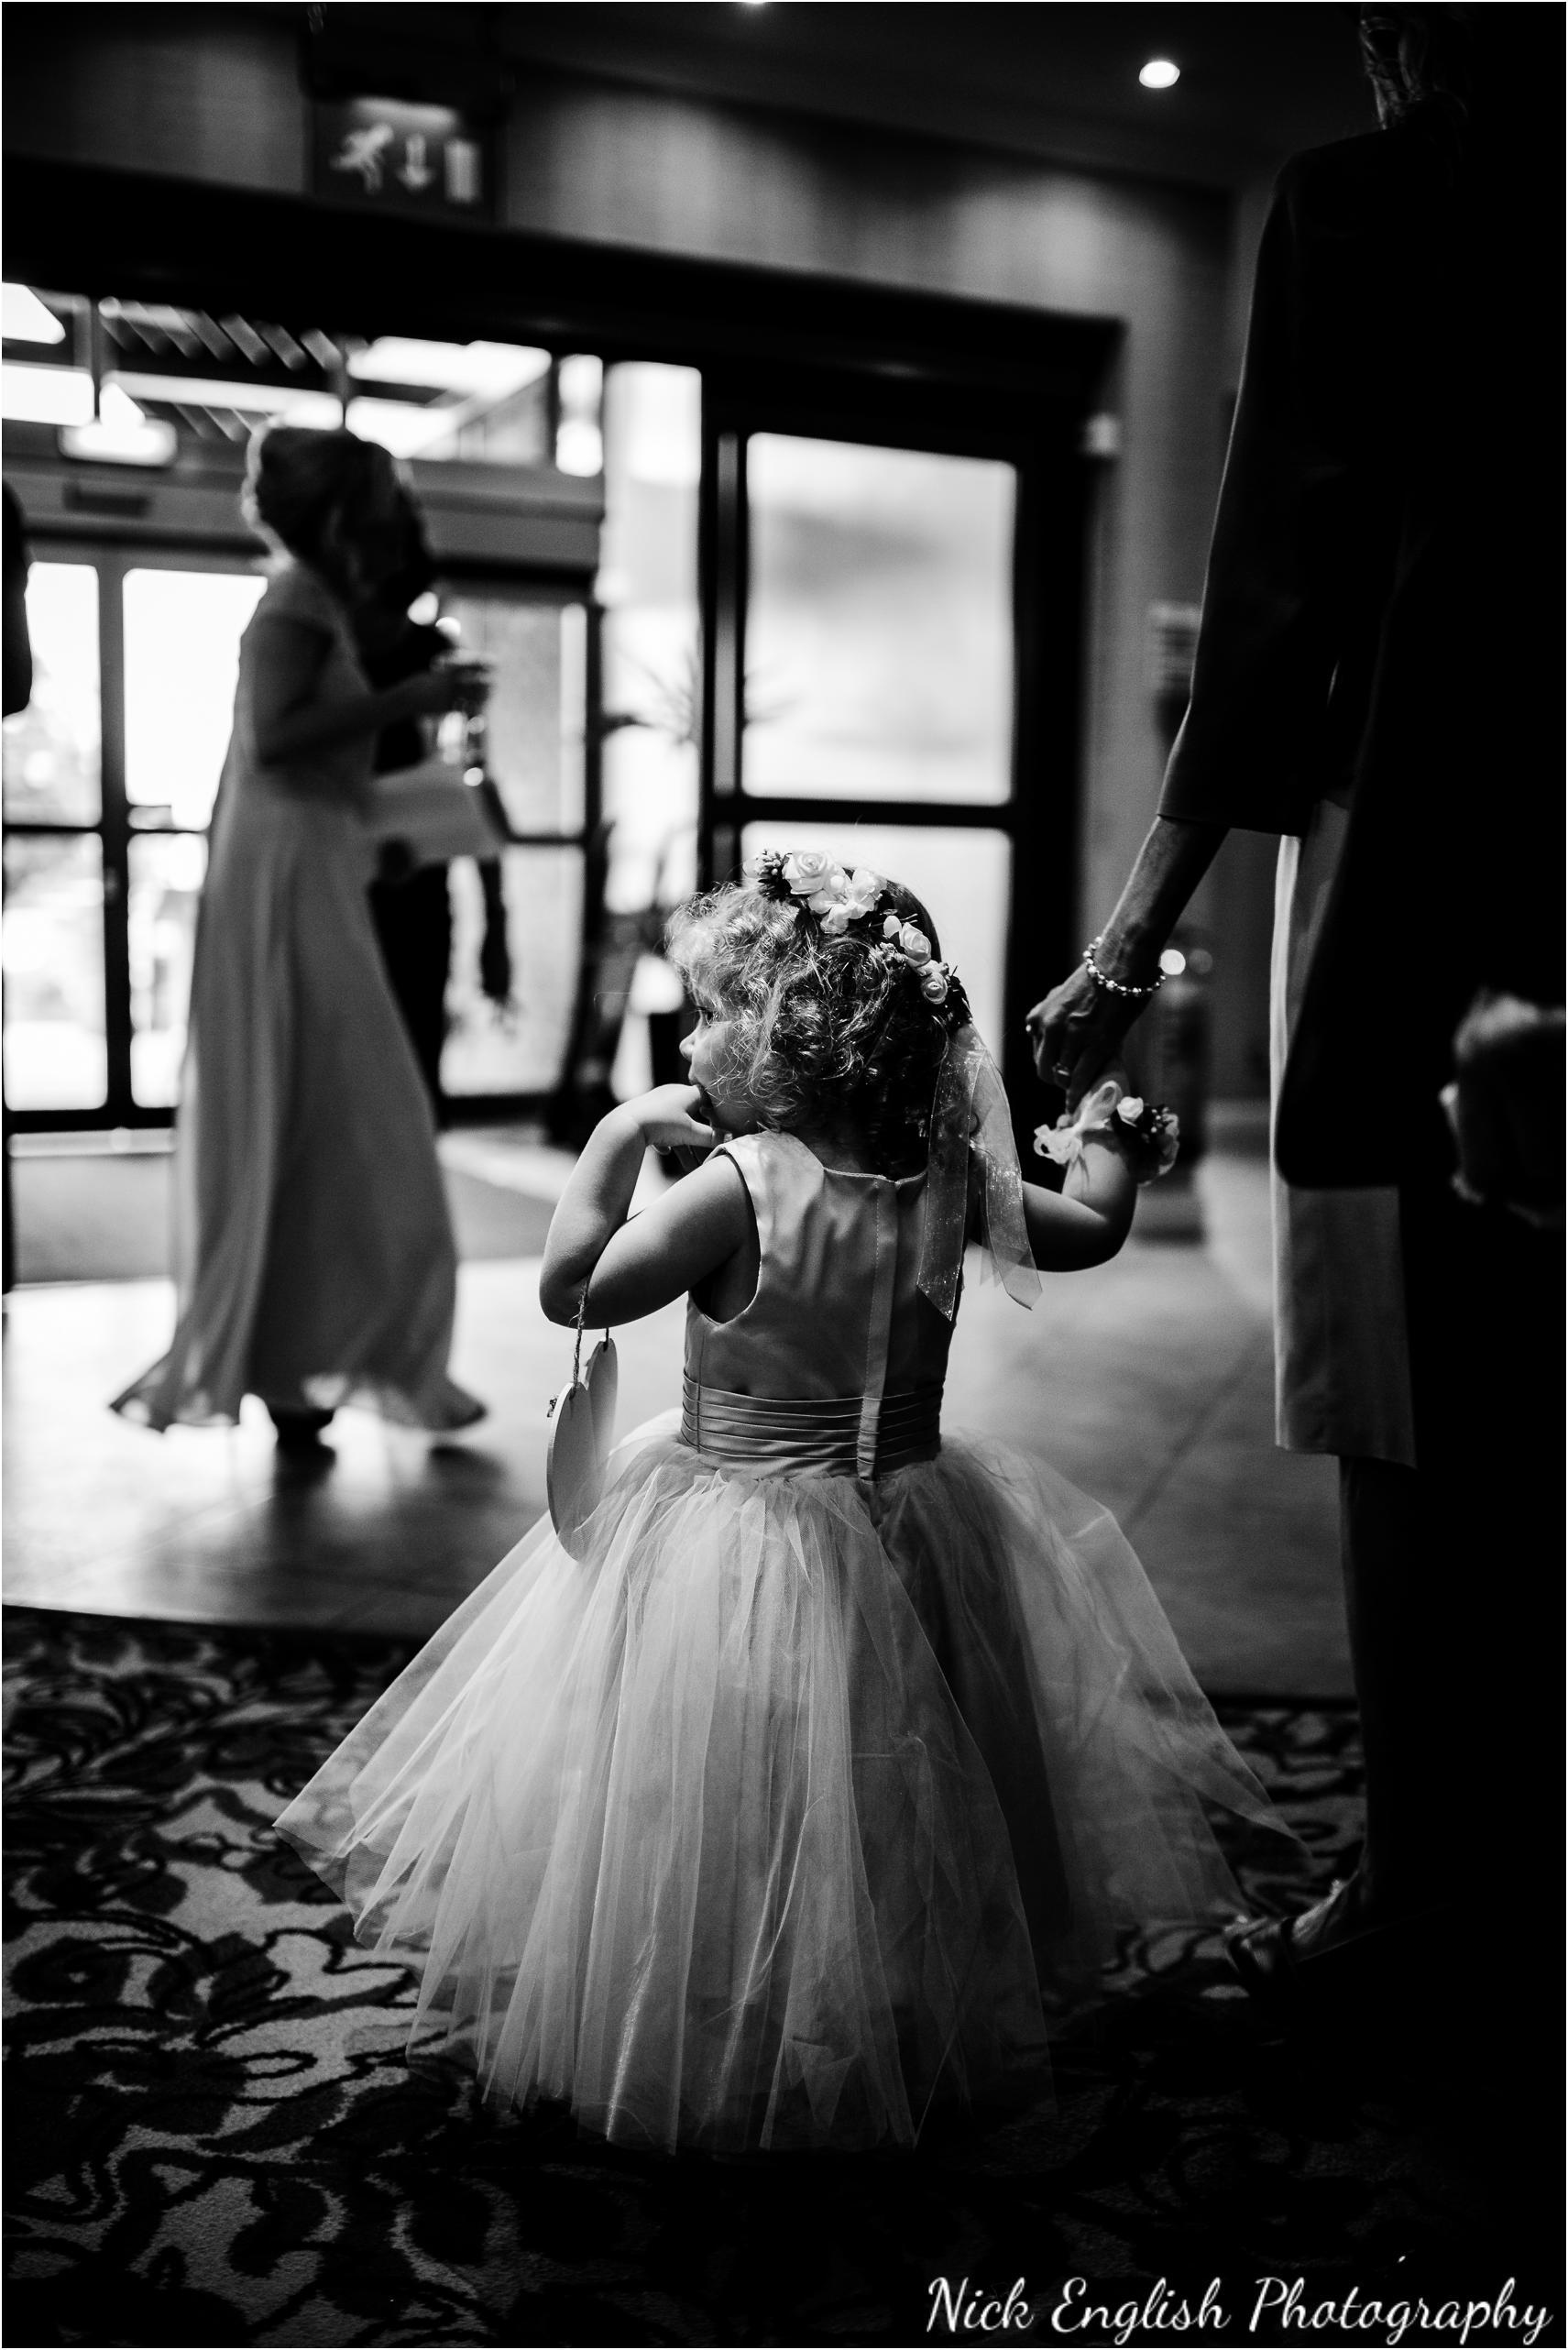 Emily David Wedding Photographs at Barton Grange Preston by Nick English Photography 46jpg.jpeg